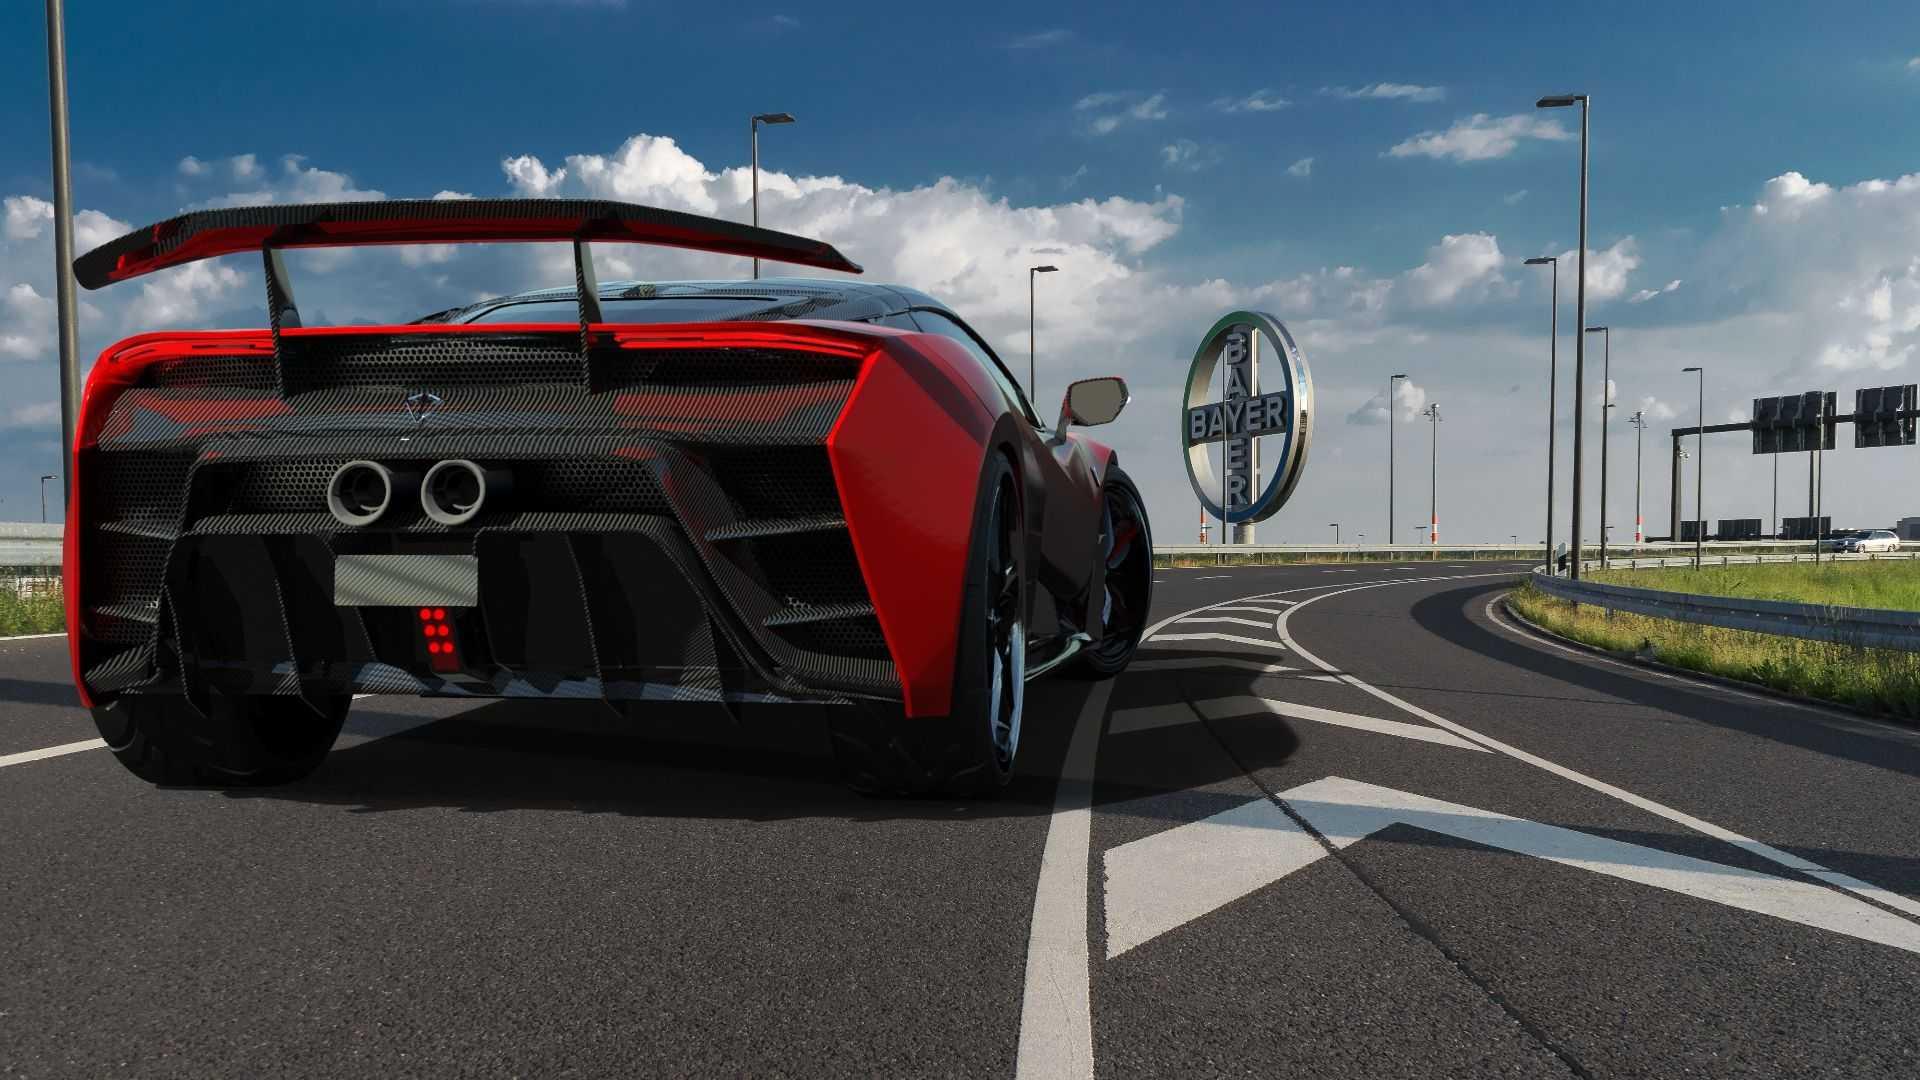 Arrera-Automobili-Illyrian-Pure-Sport-Renderings-4